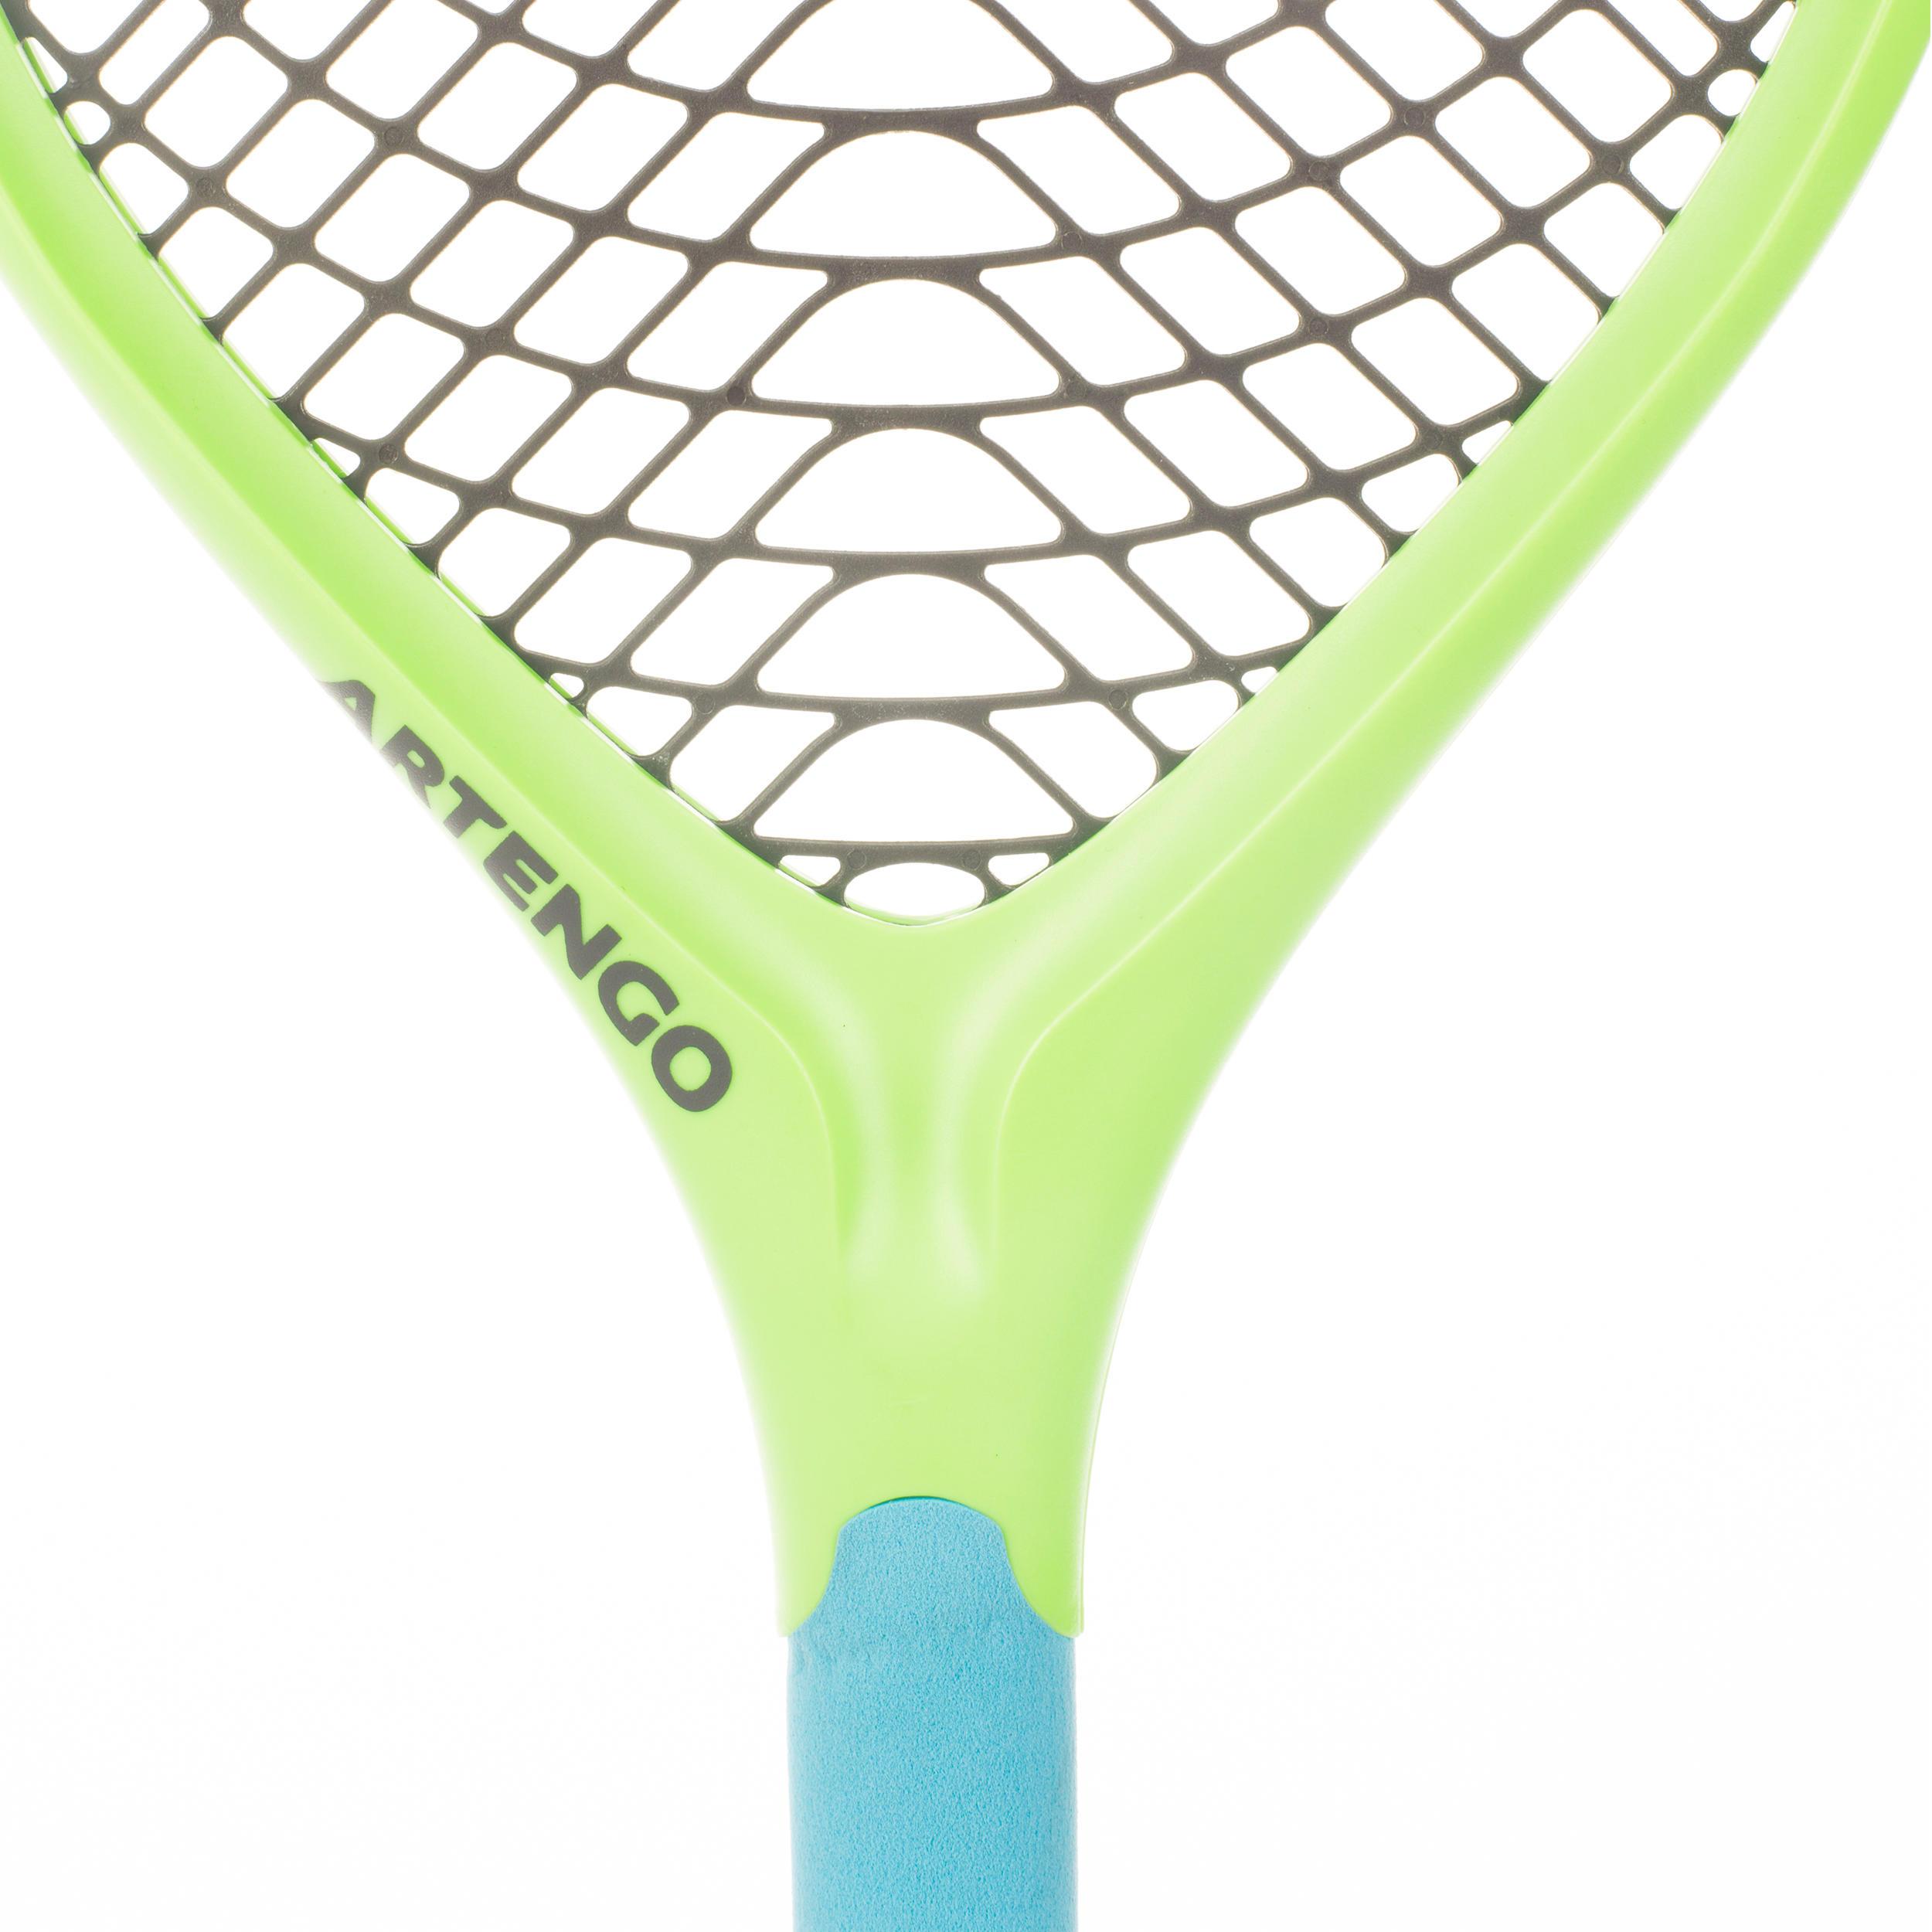 Ensemble de 2 raquettes de tennis en plastique Funyten bleu vert